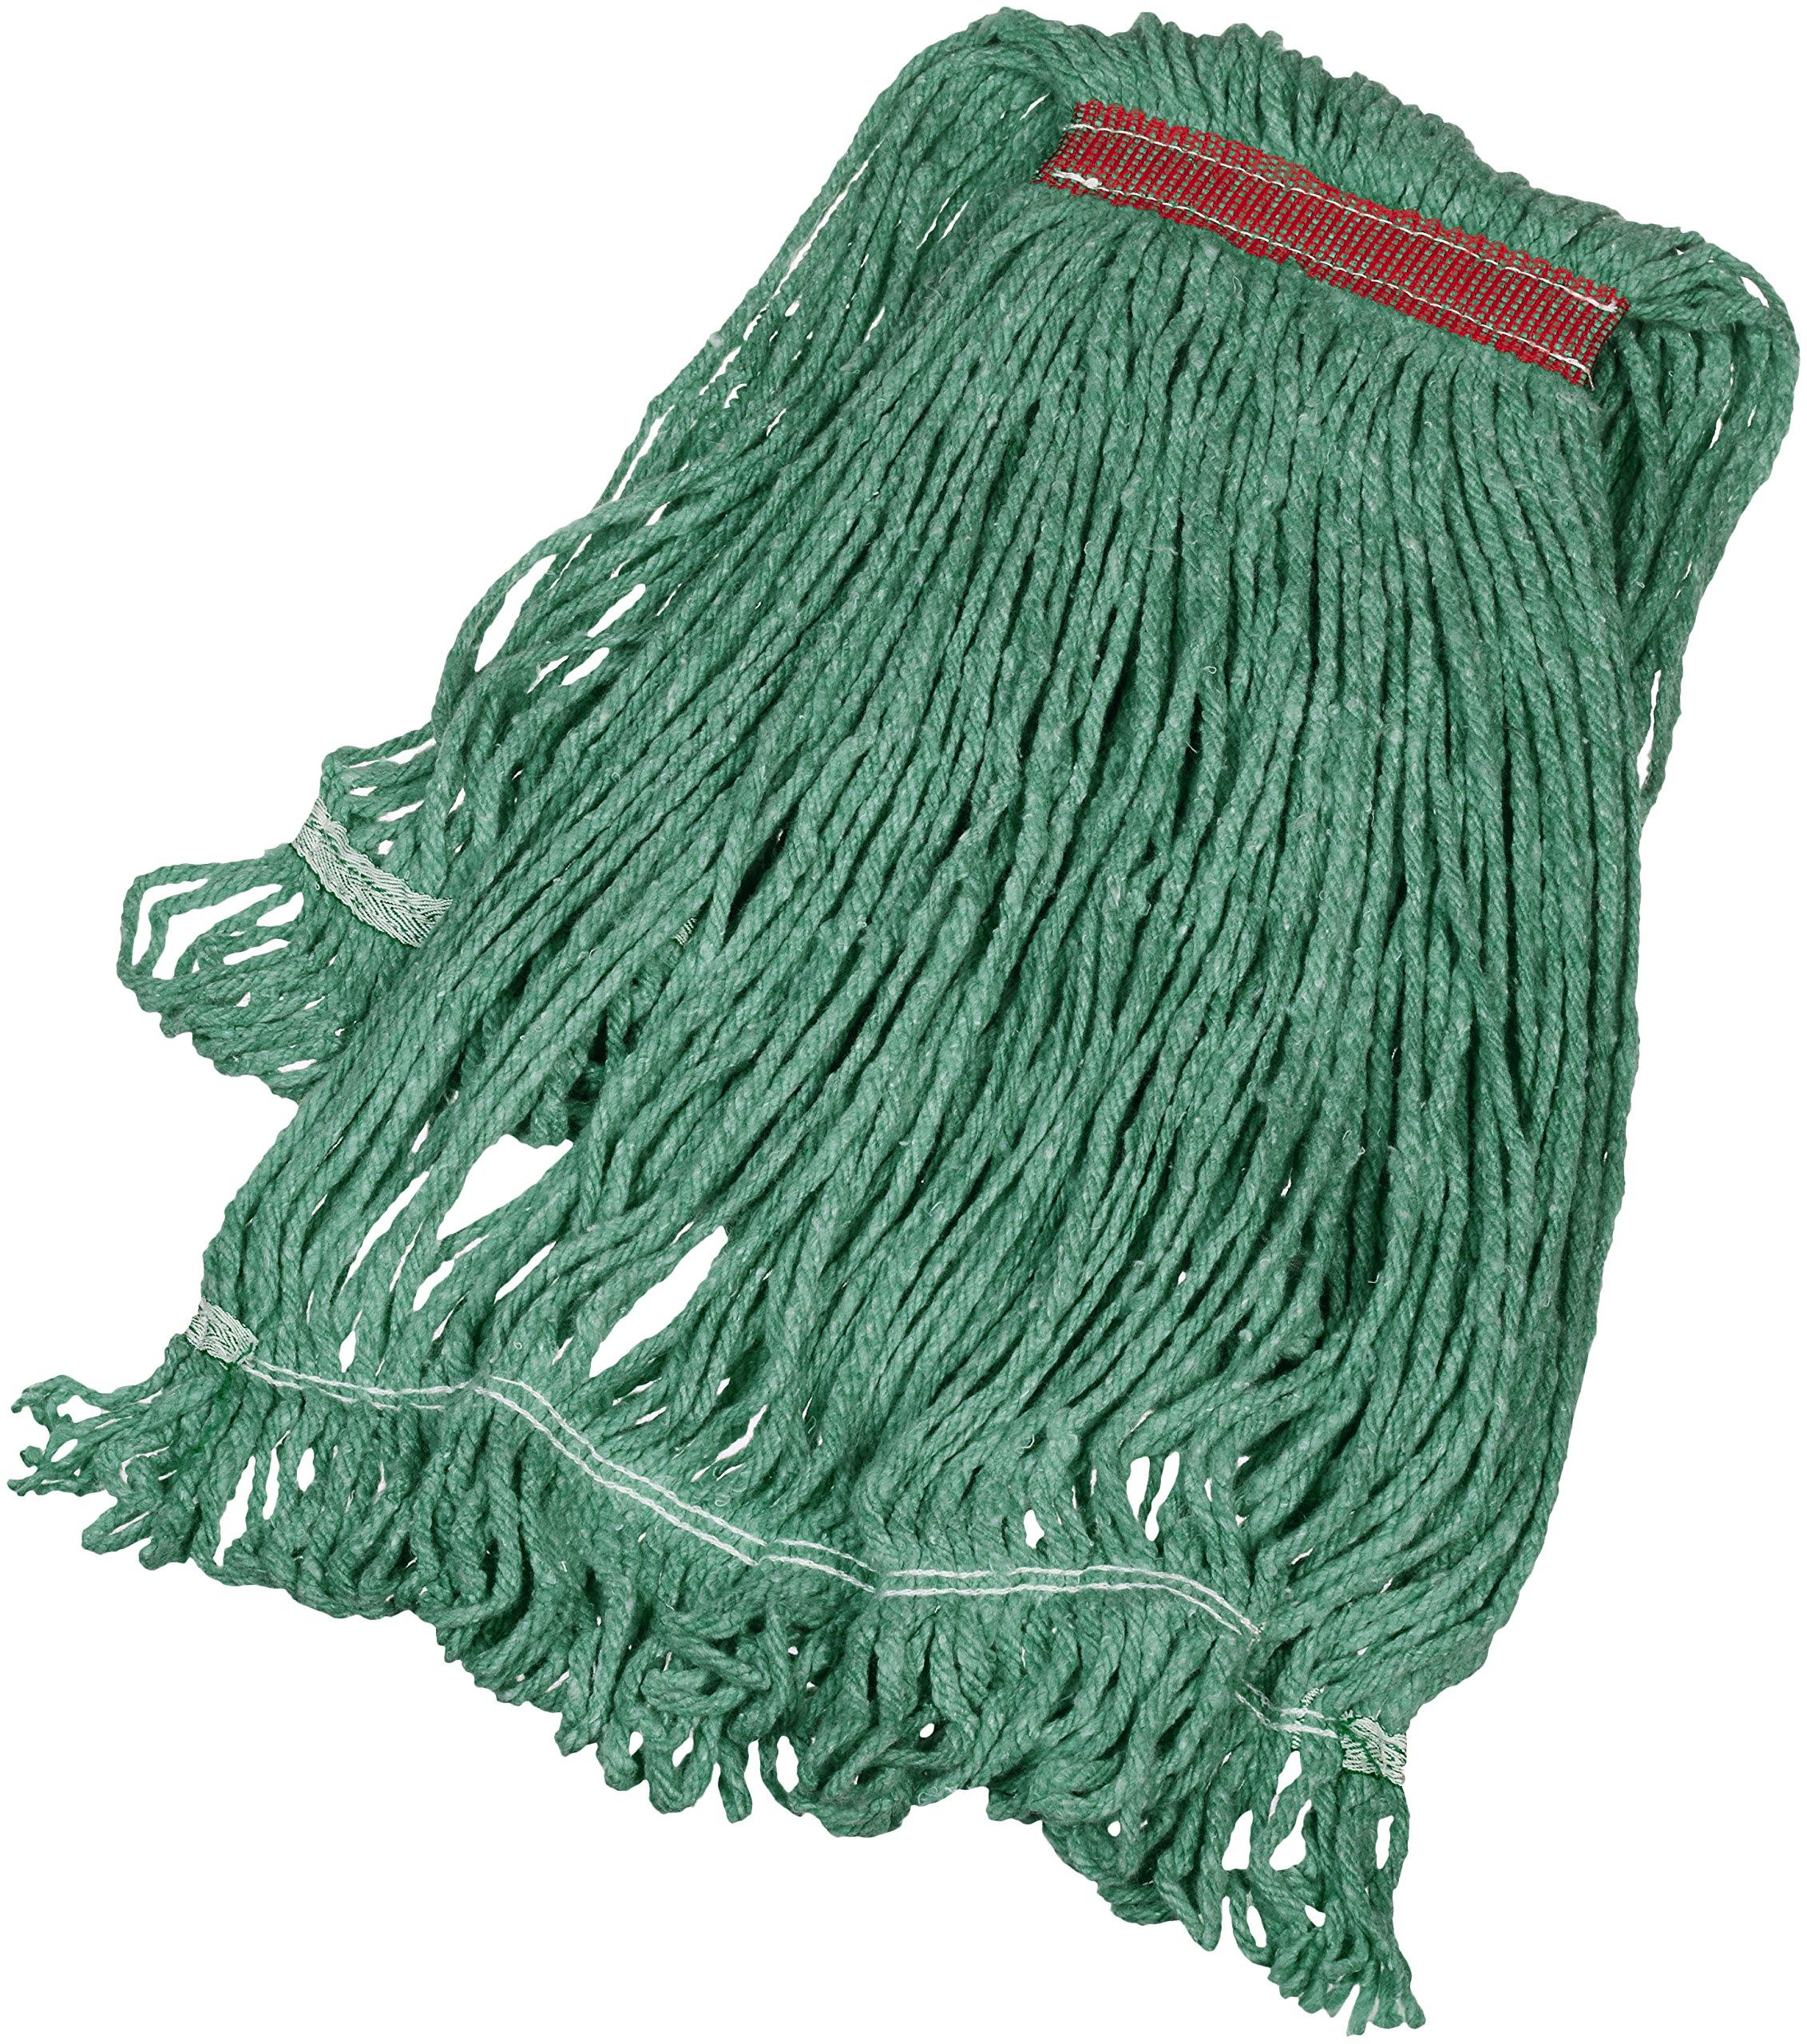 AmazonBasics Loop-End Synthetic Mop Head, 1.25-Inch Headband, Large, Green - 6-Pack